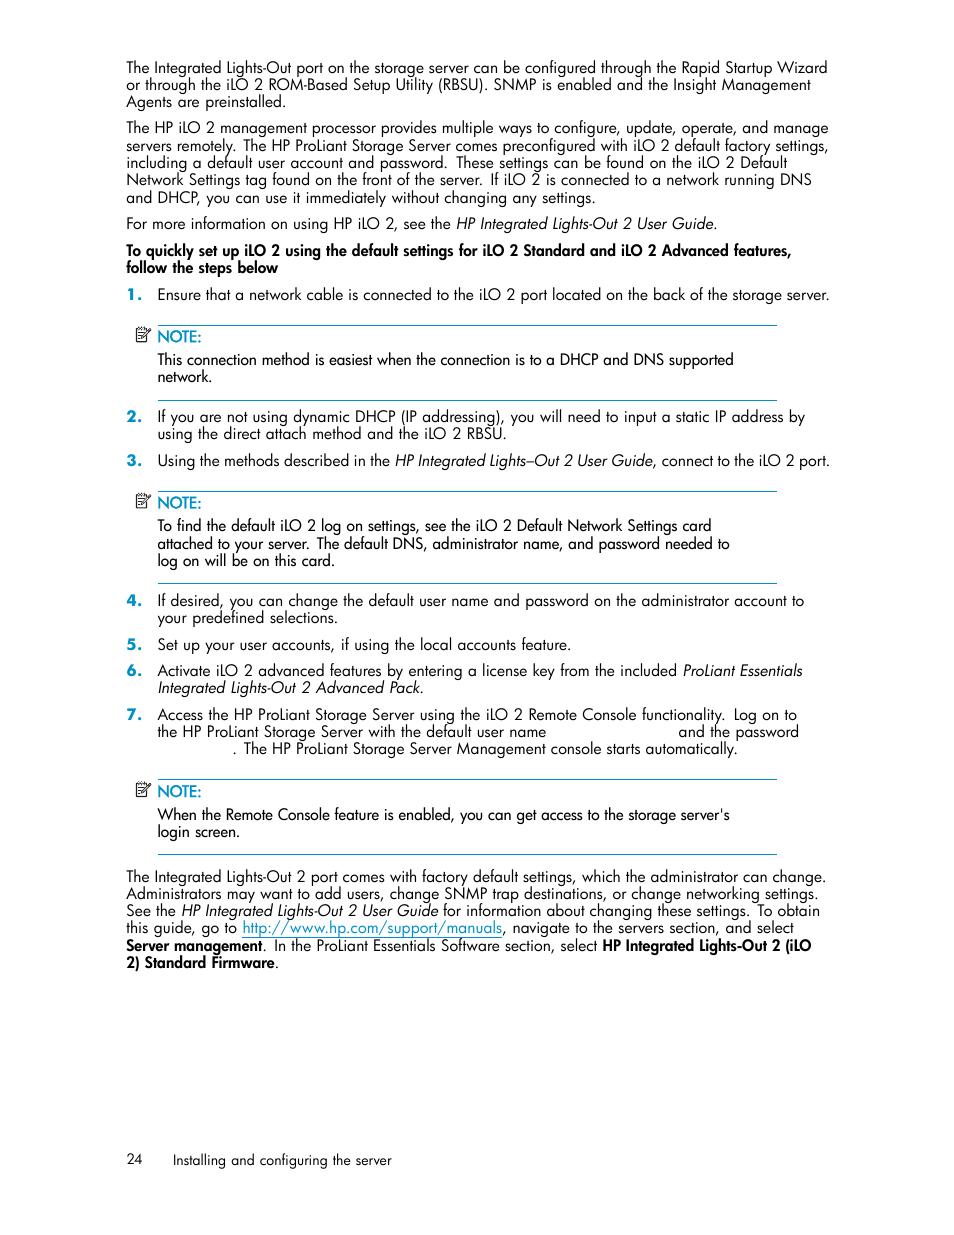 HP ProLiant DL585 G2 Storage-Server User Manual | Page 24 / 150